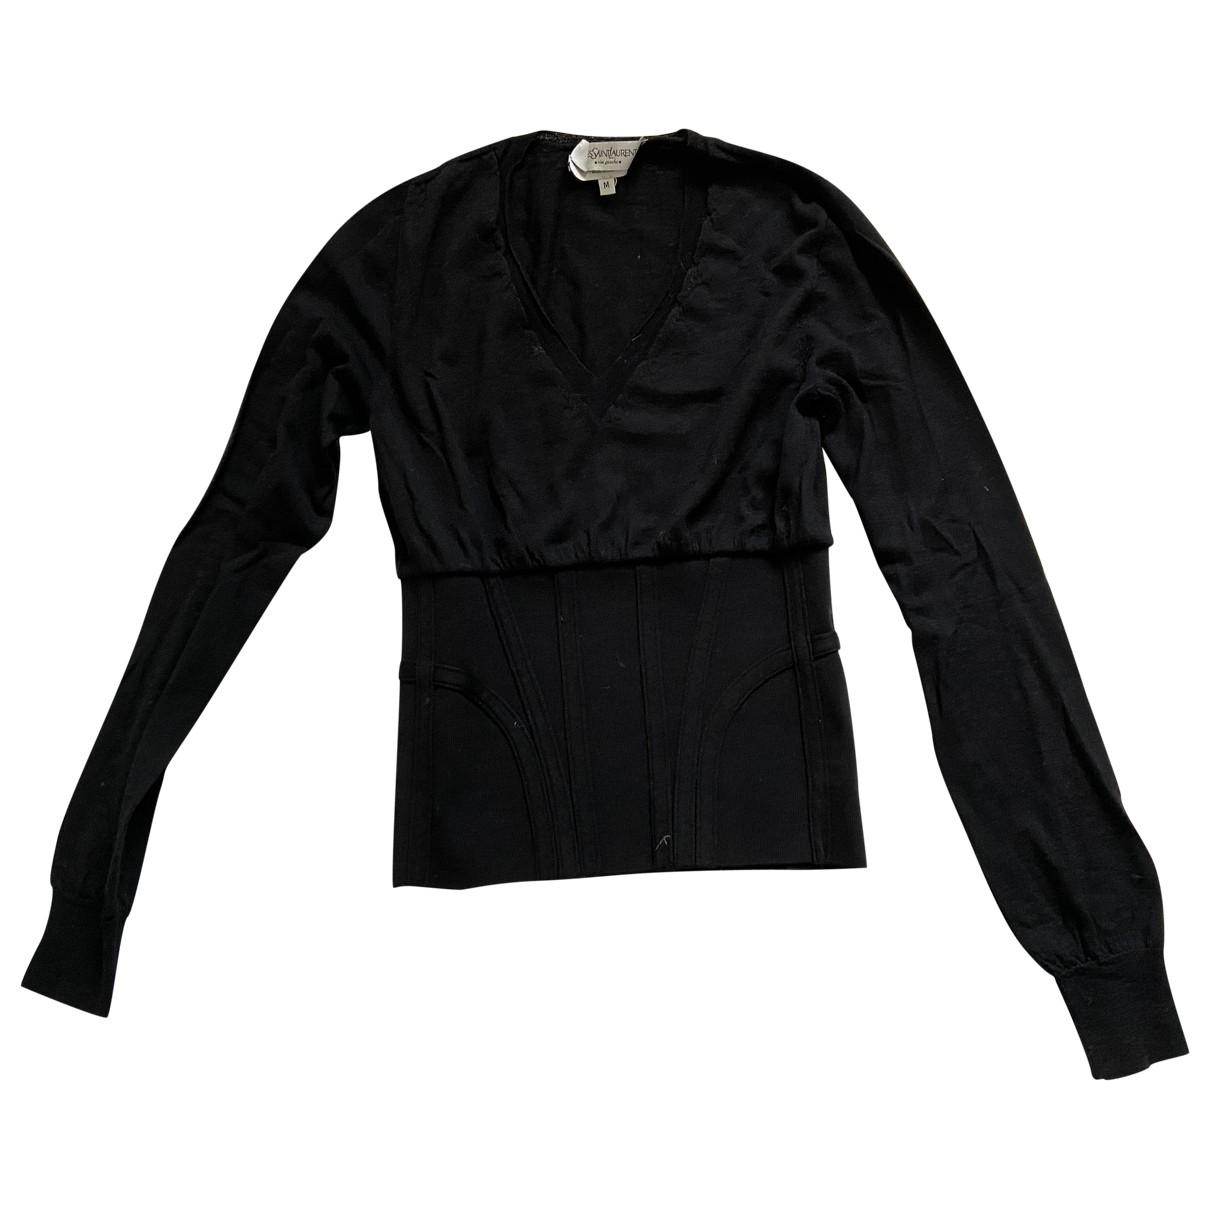 Yves Saint Laurent \N Black Wool Knitwear for Women M International